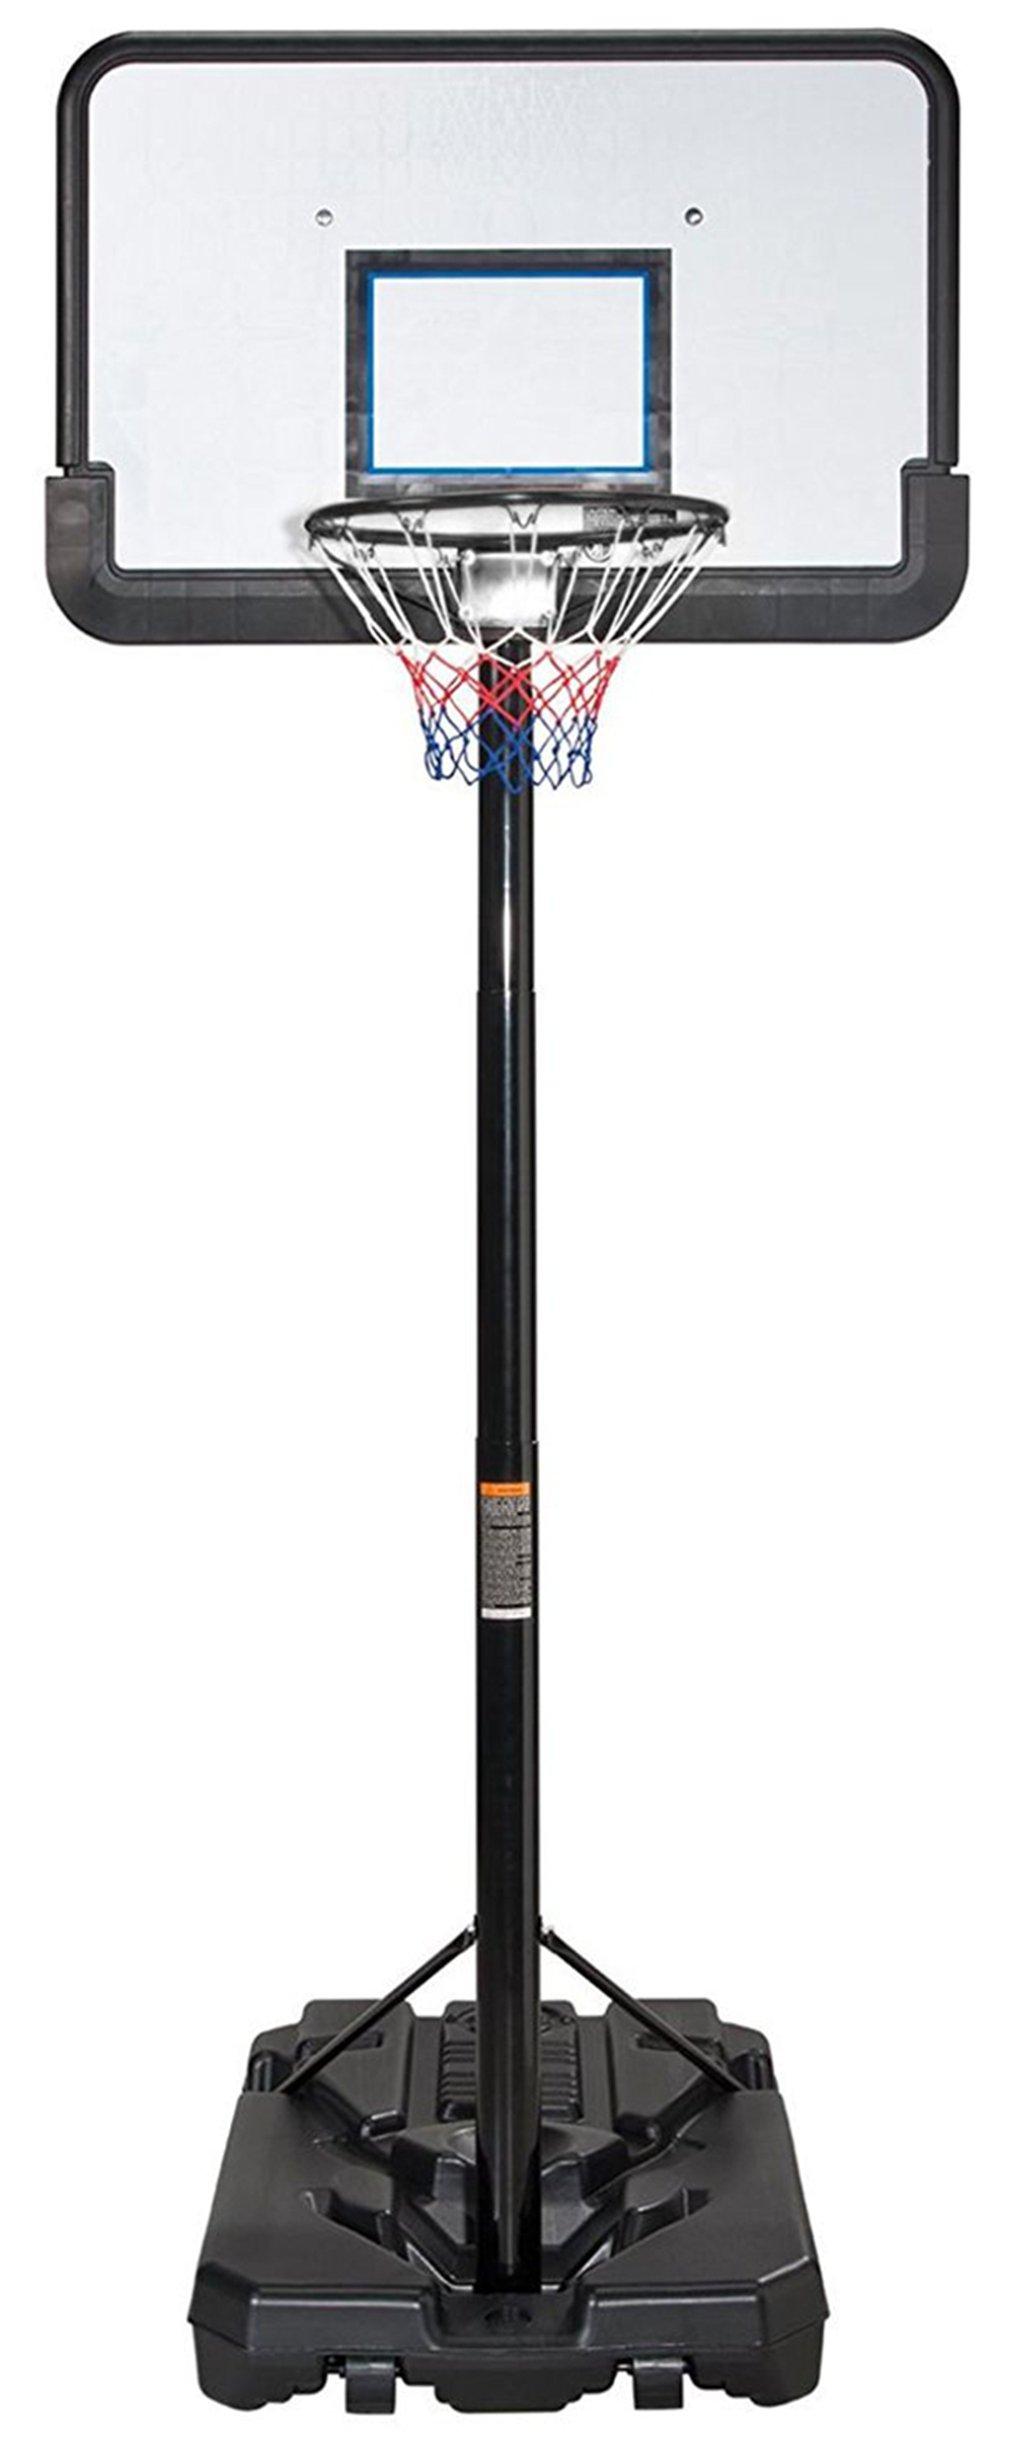 KLB Sport Pro Court Height Adjustable Portable Basketball Hoop System w/Wheels, 43 Inch Backboard (Black Coated)